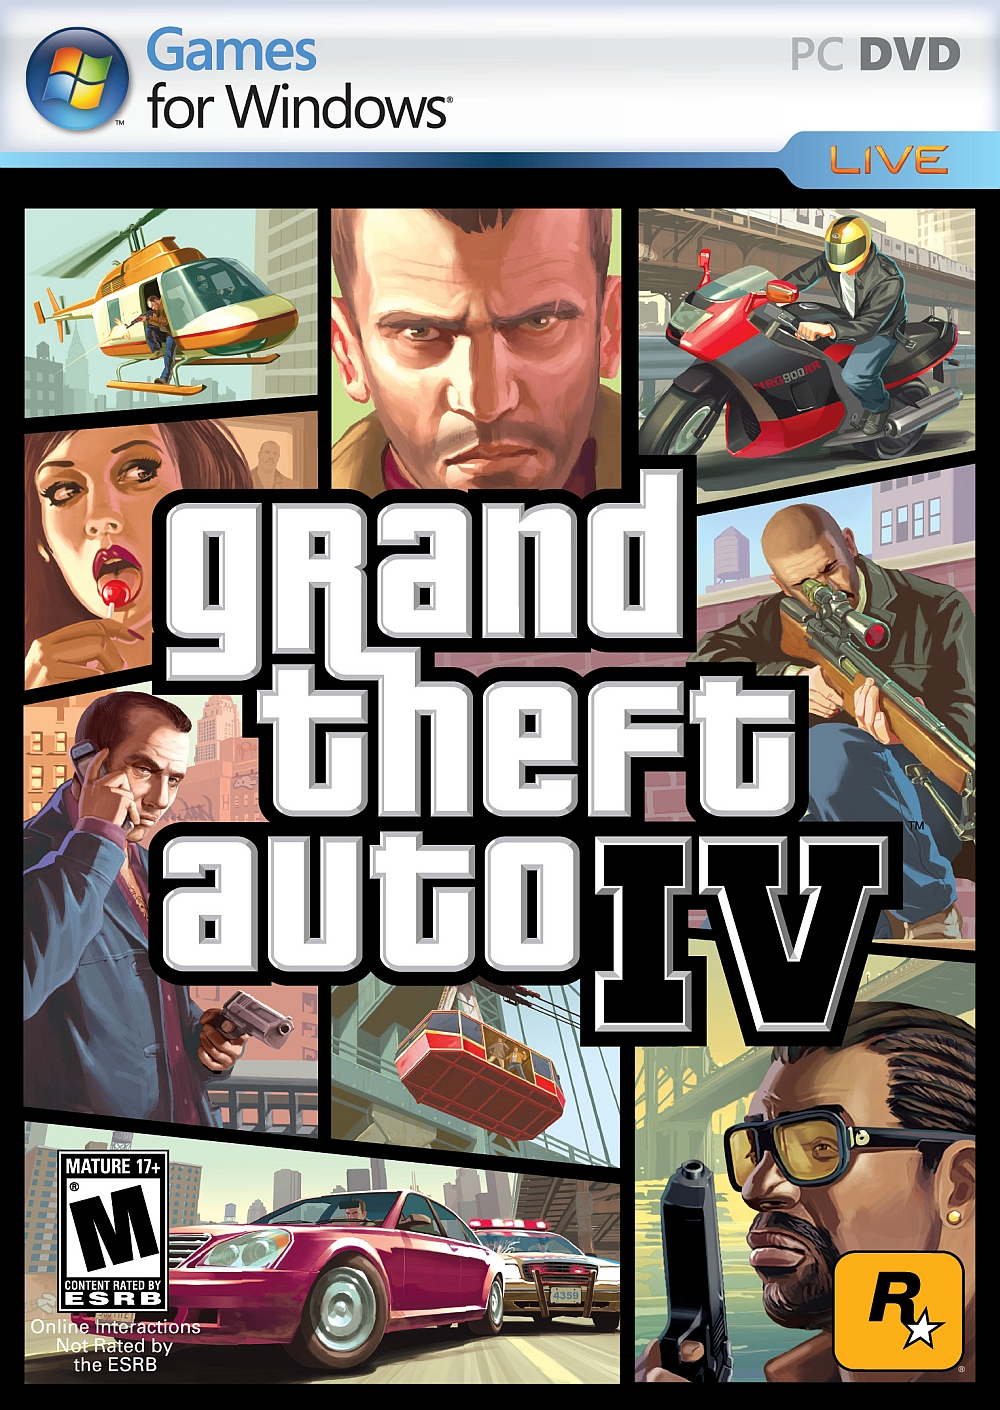 Grand theft auto iv windows 7